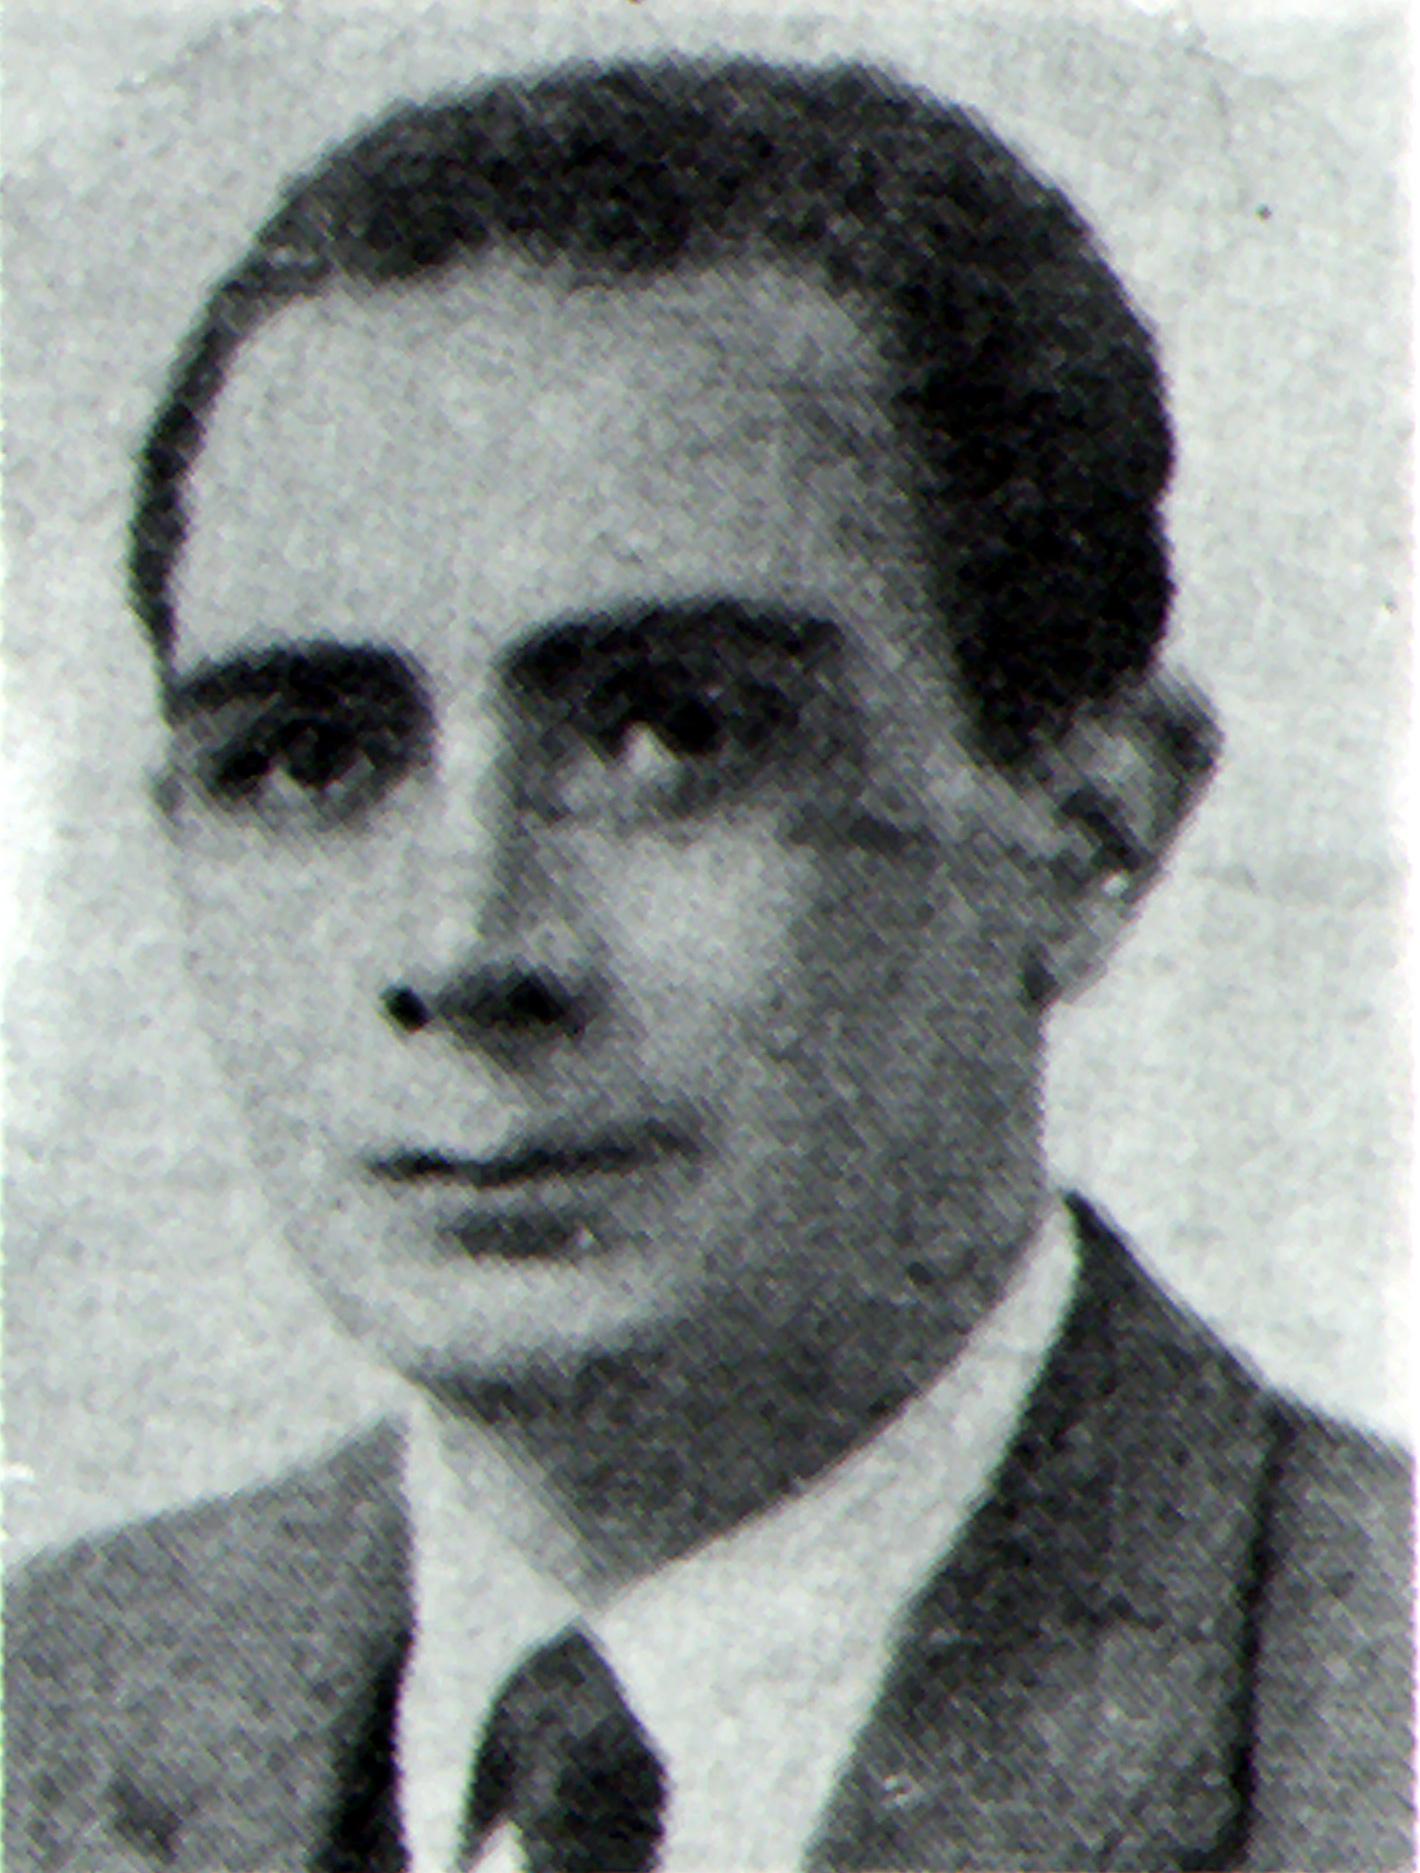 Canalis Salvatore 1908